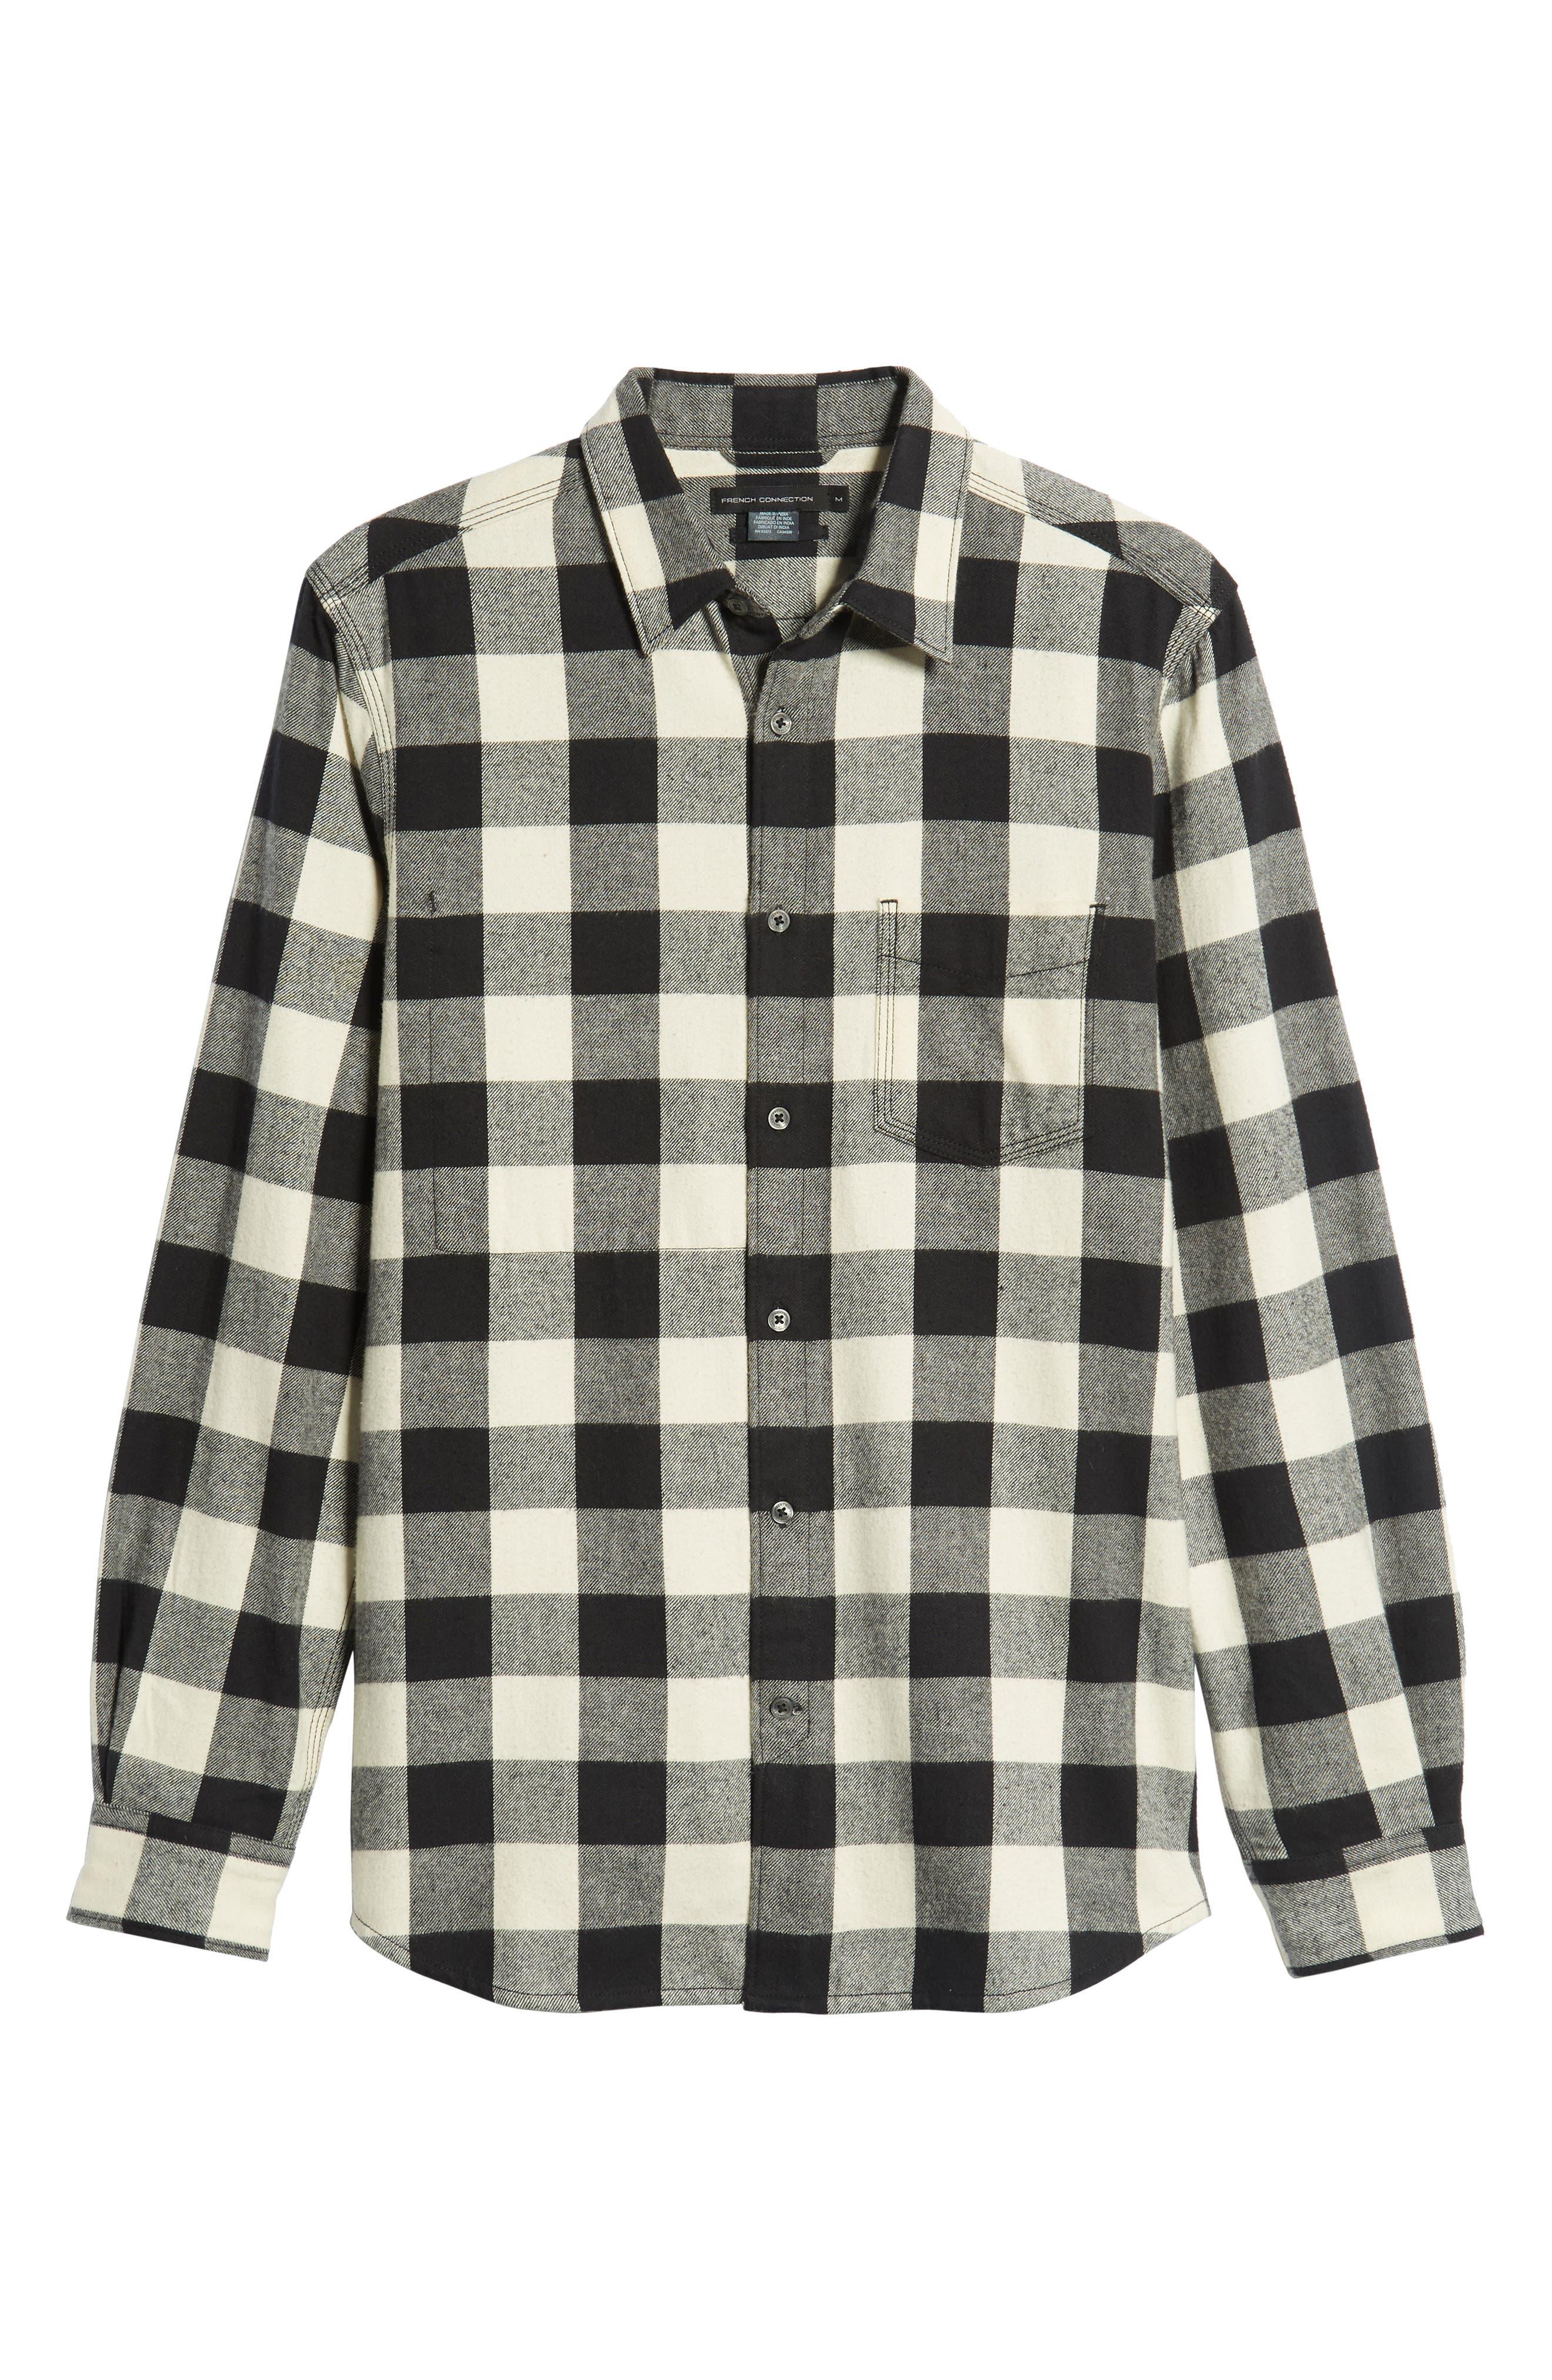 Kahama Regular Fit Flannel Sport Shirt,                             Alternate thumbnail 5, color,                             BLACK WHITECAP GREY